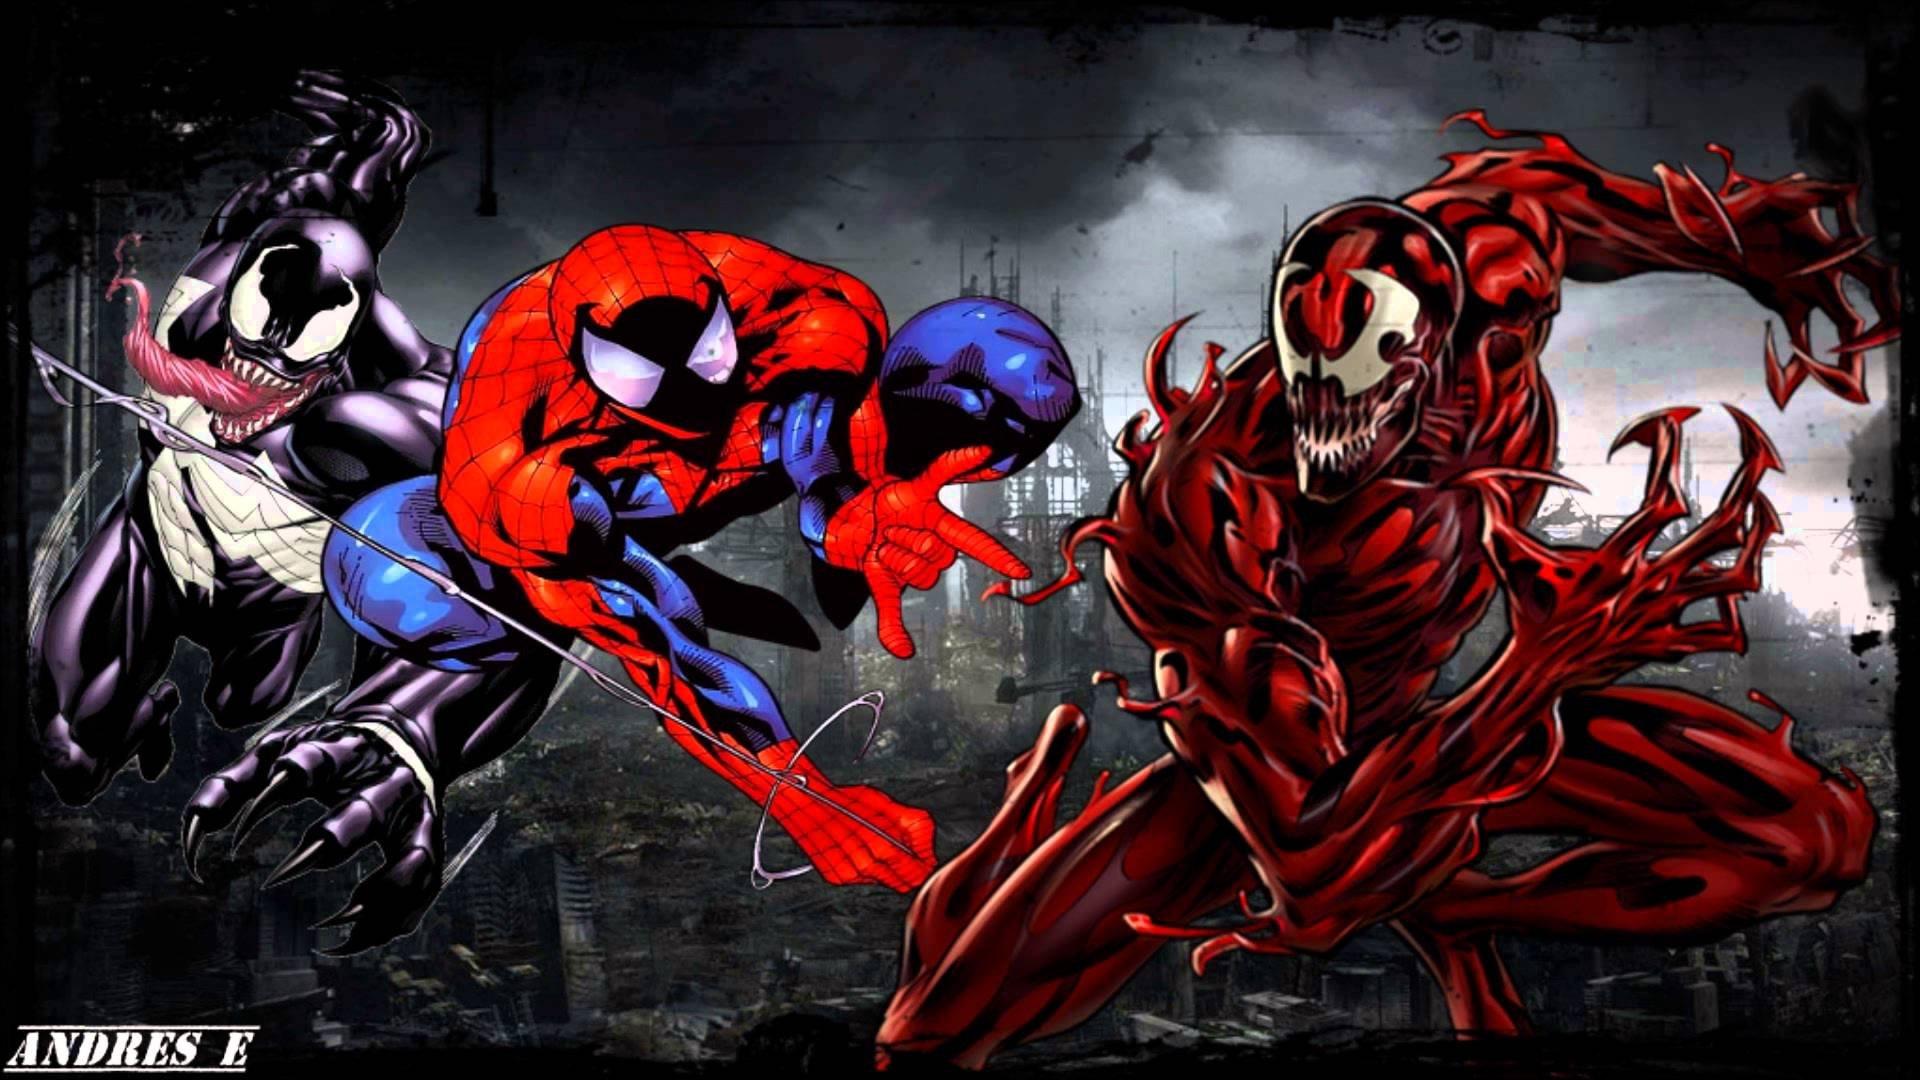 Spider-Man Venom Maximum Carnage scrolling fighting action ...